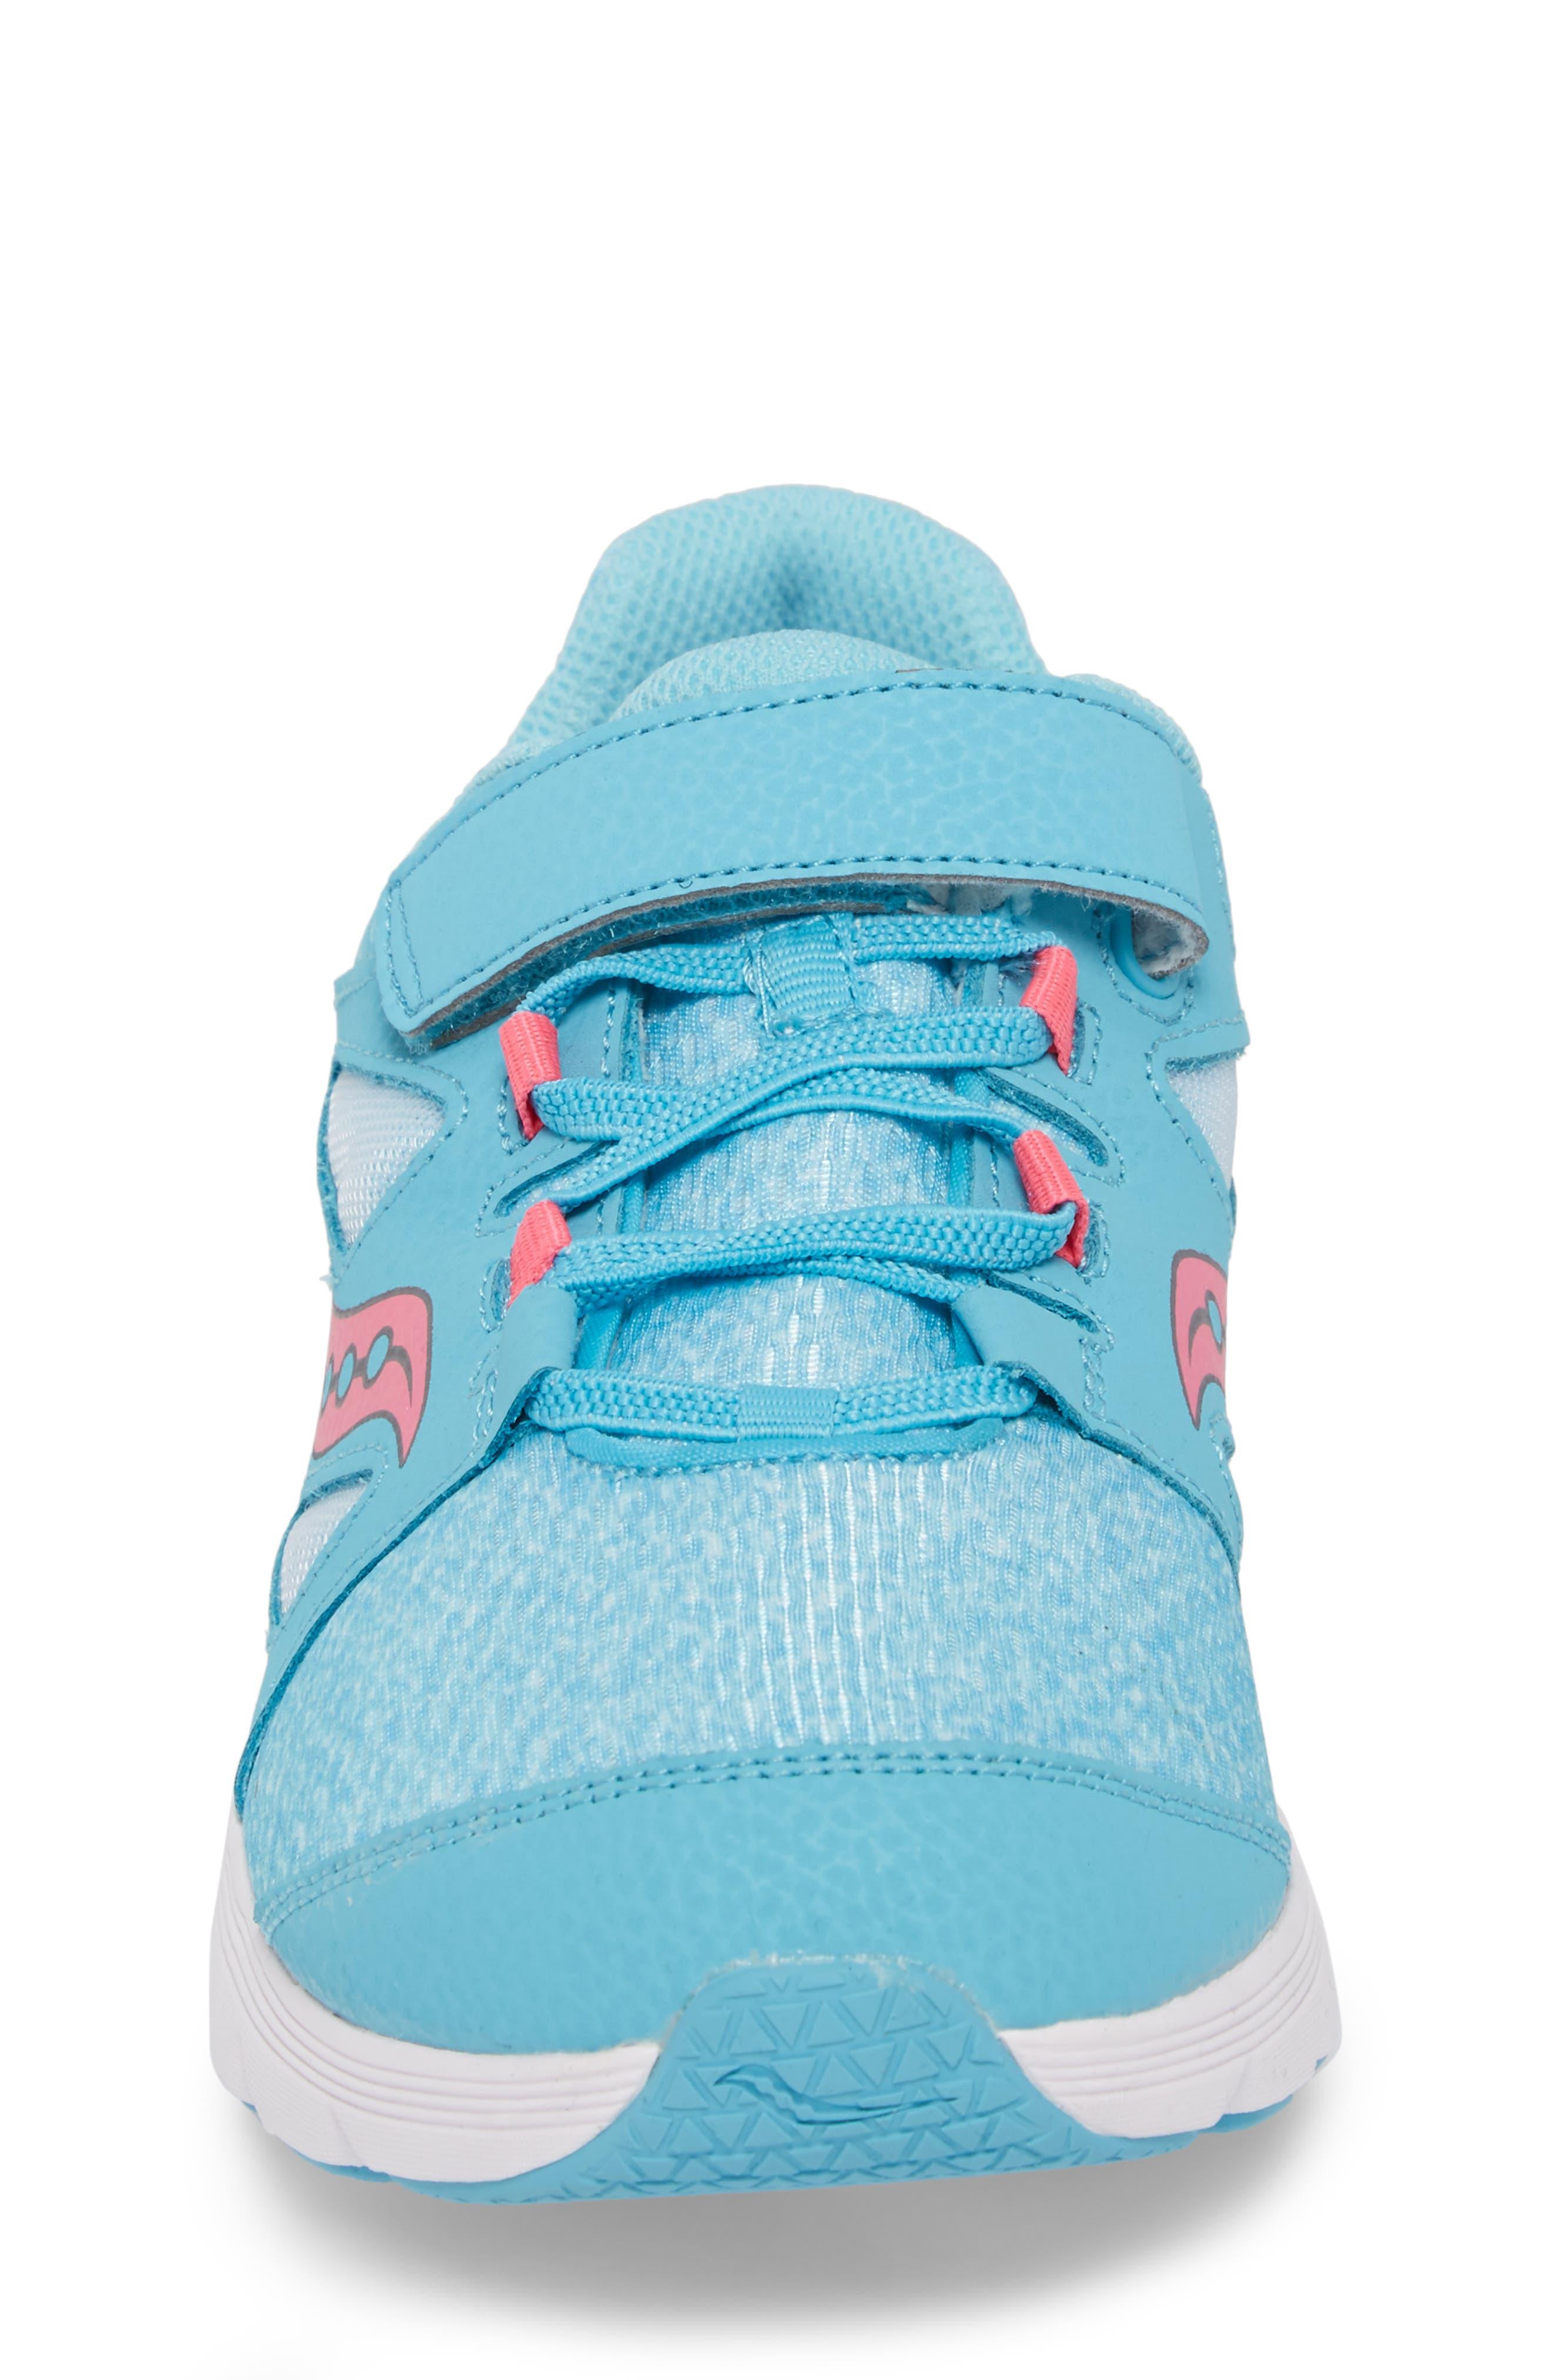 Kotaro 4 Sneaker,                             Alternate thumbnail 4, color,                             Turquoise/ Pink